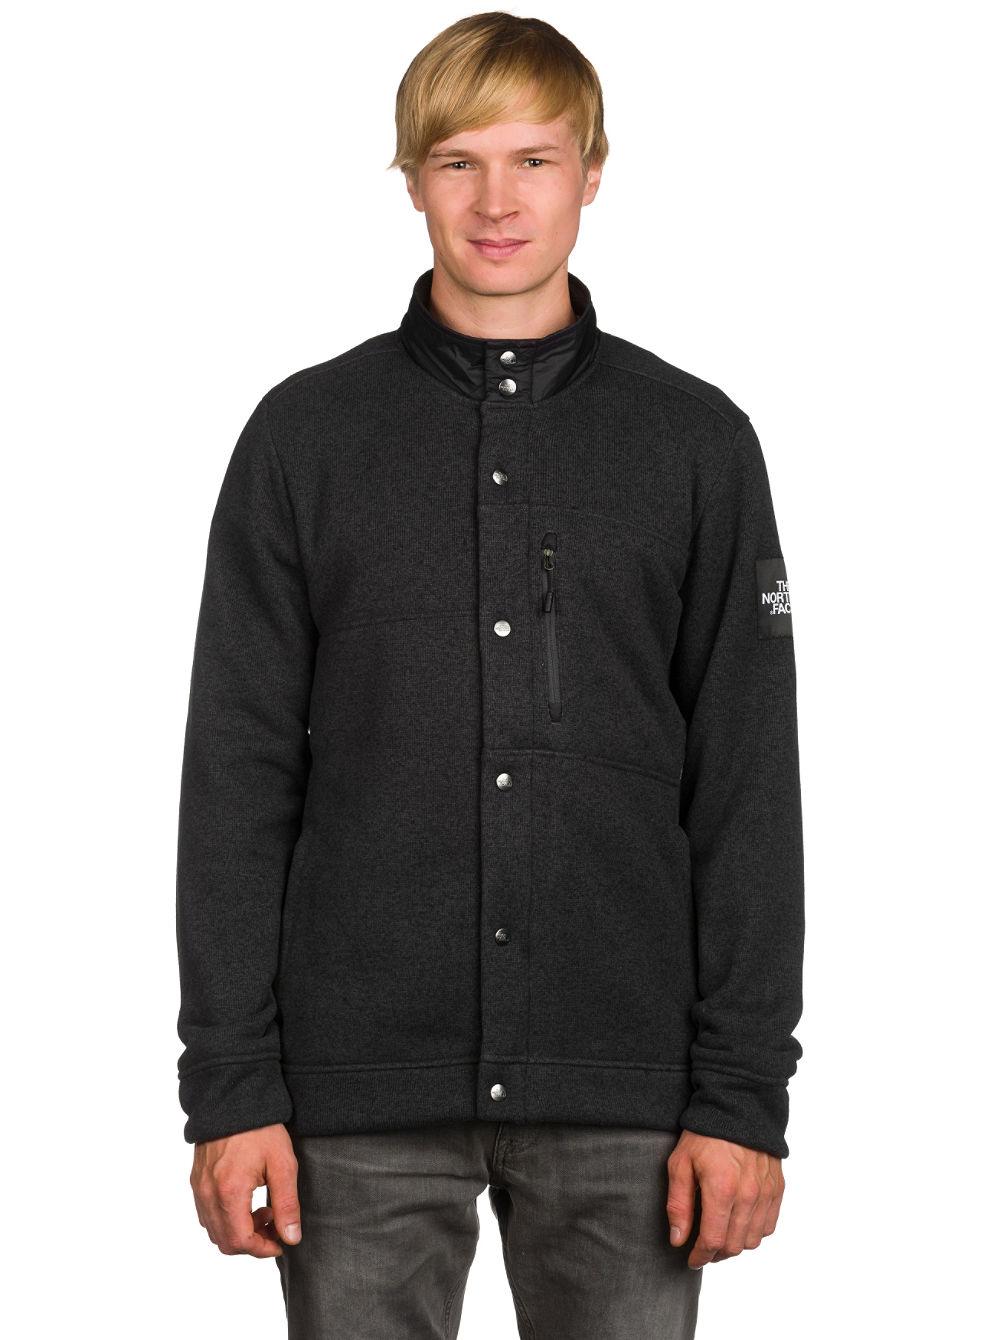 the-north-face-denali-cardigan-jacket